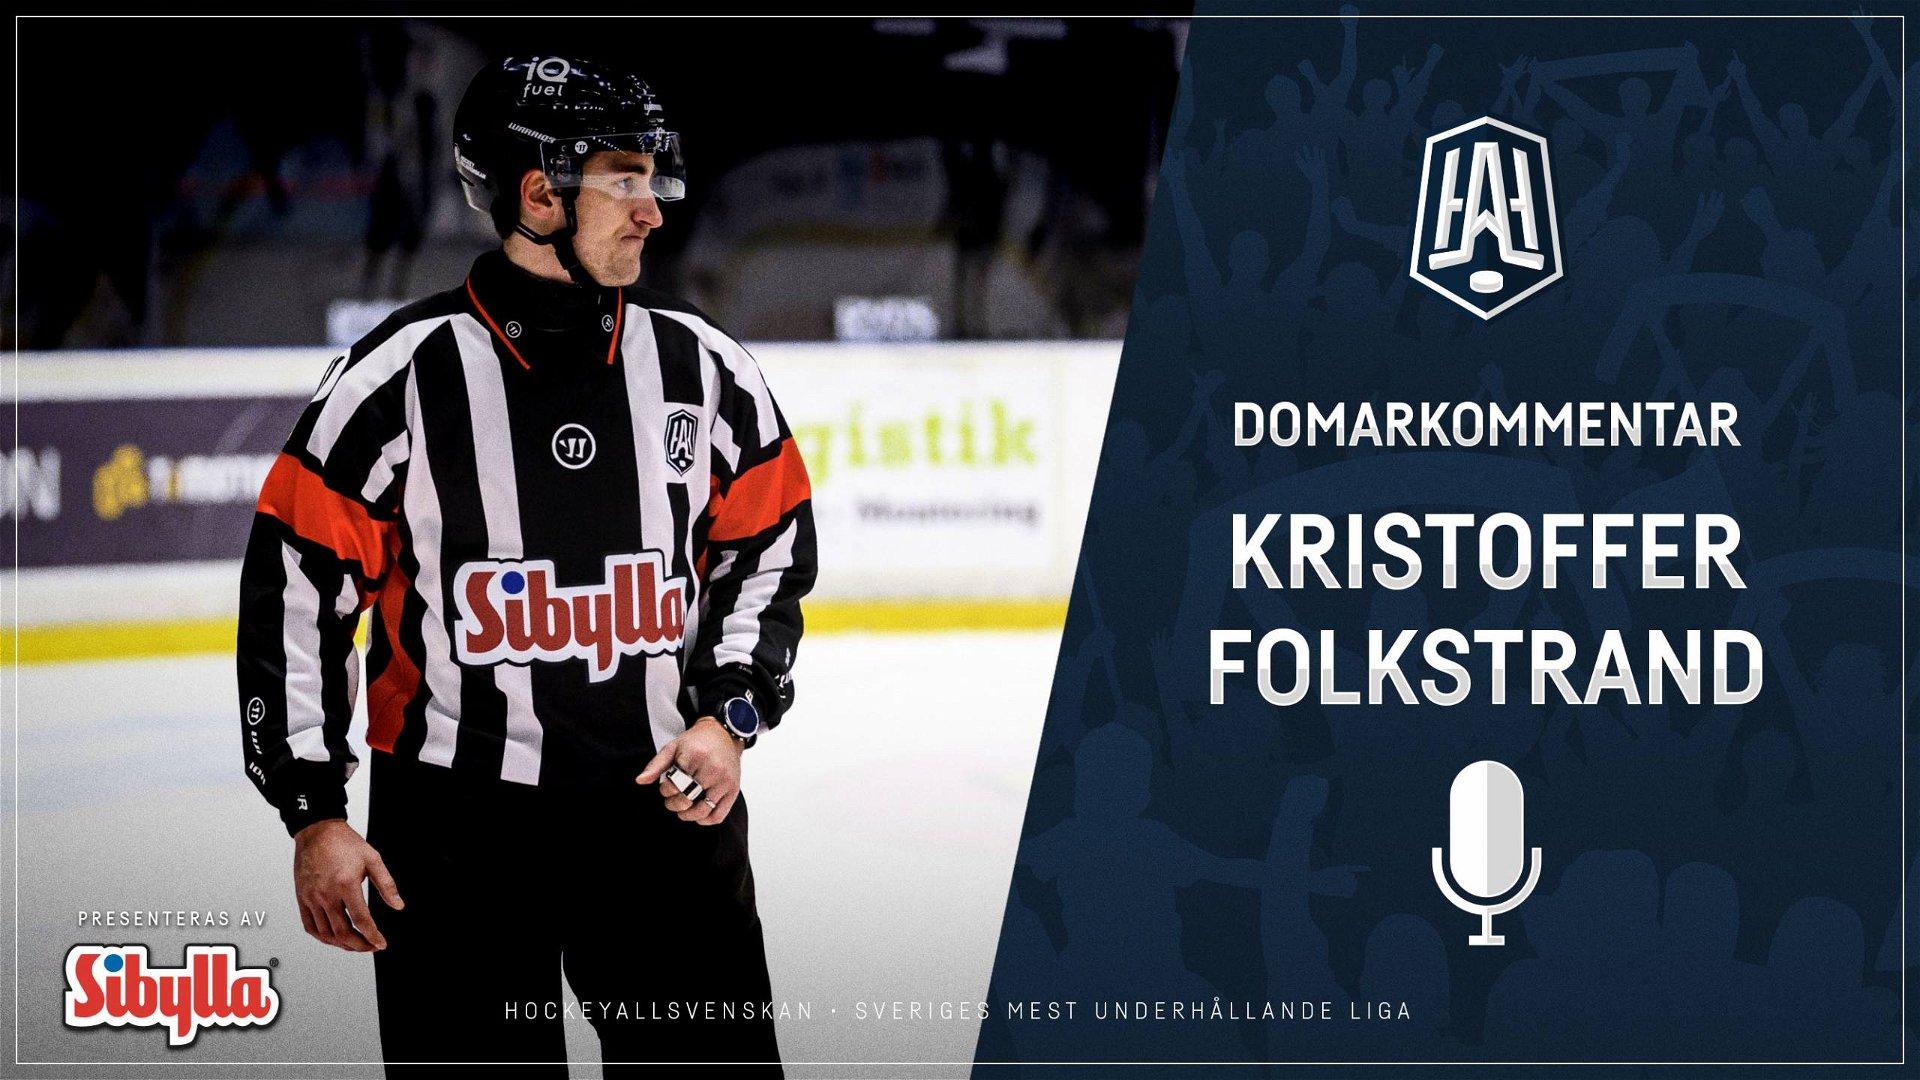 Domarkommentar: Kristoffer Folkstrand